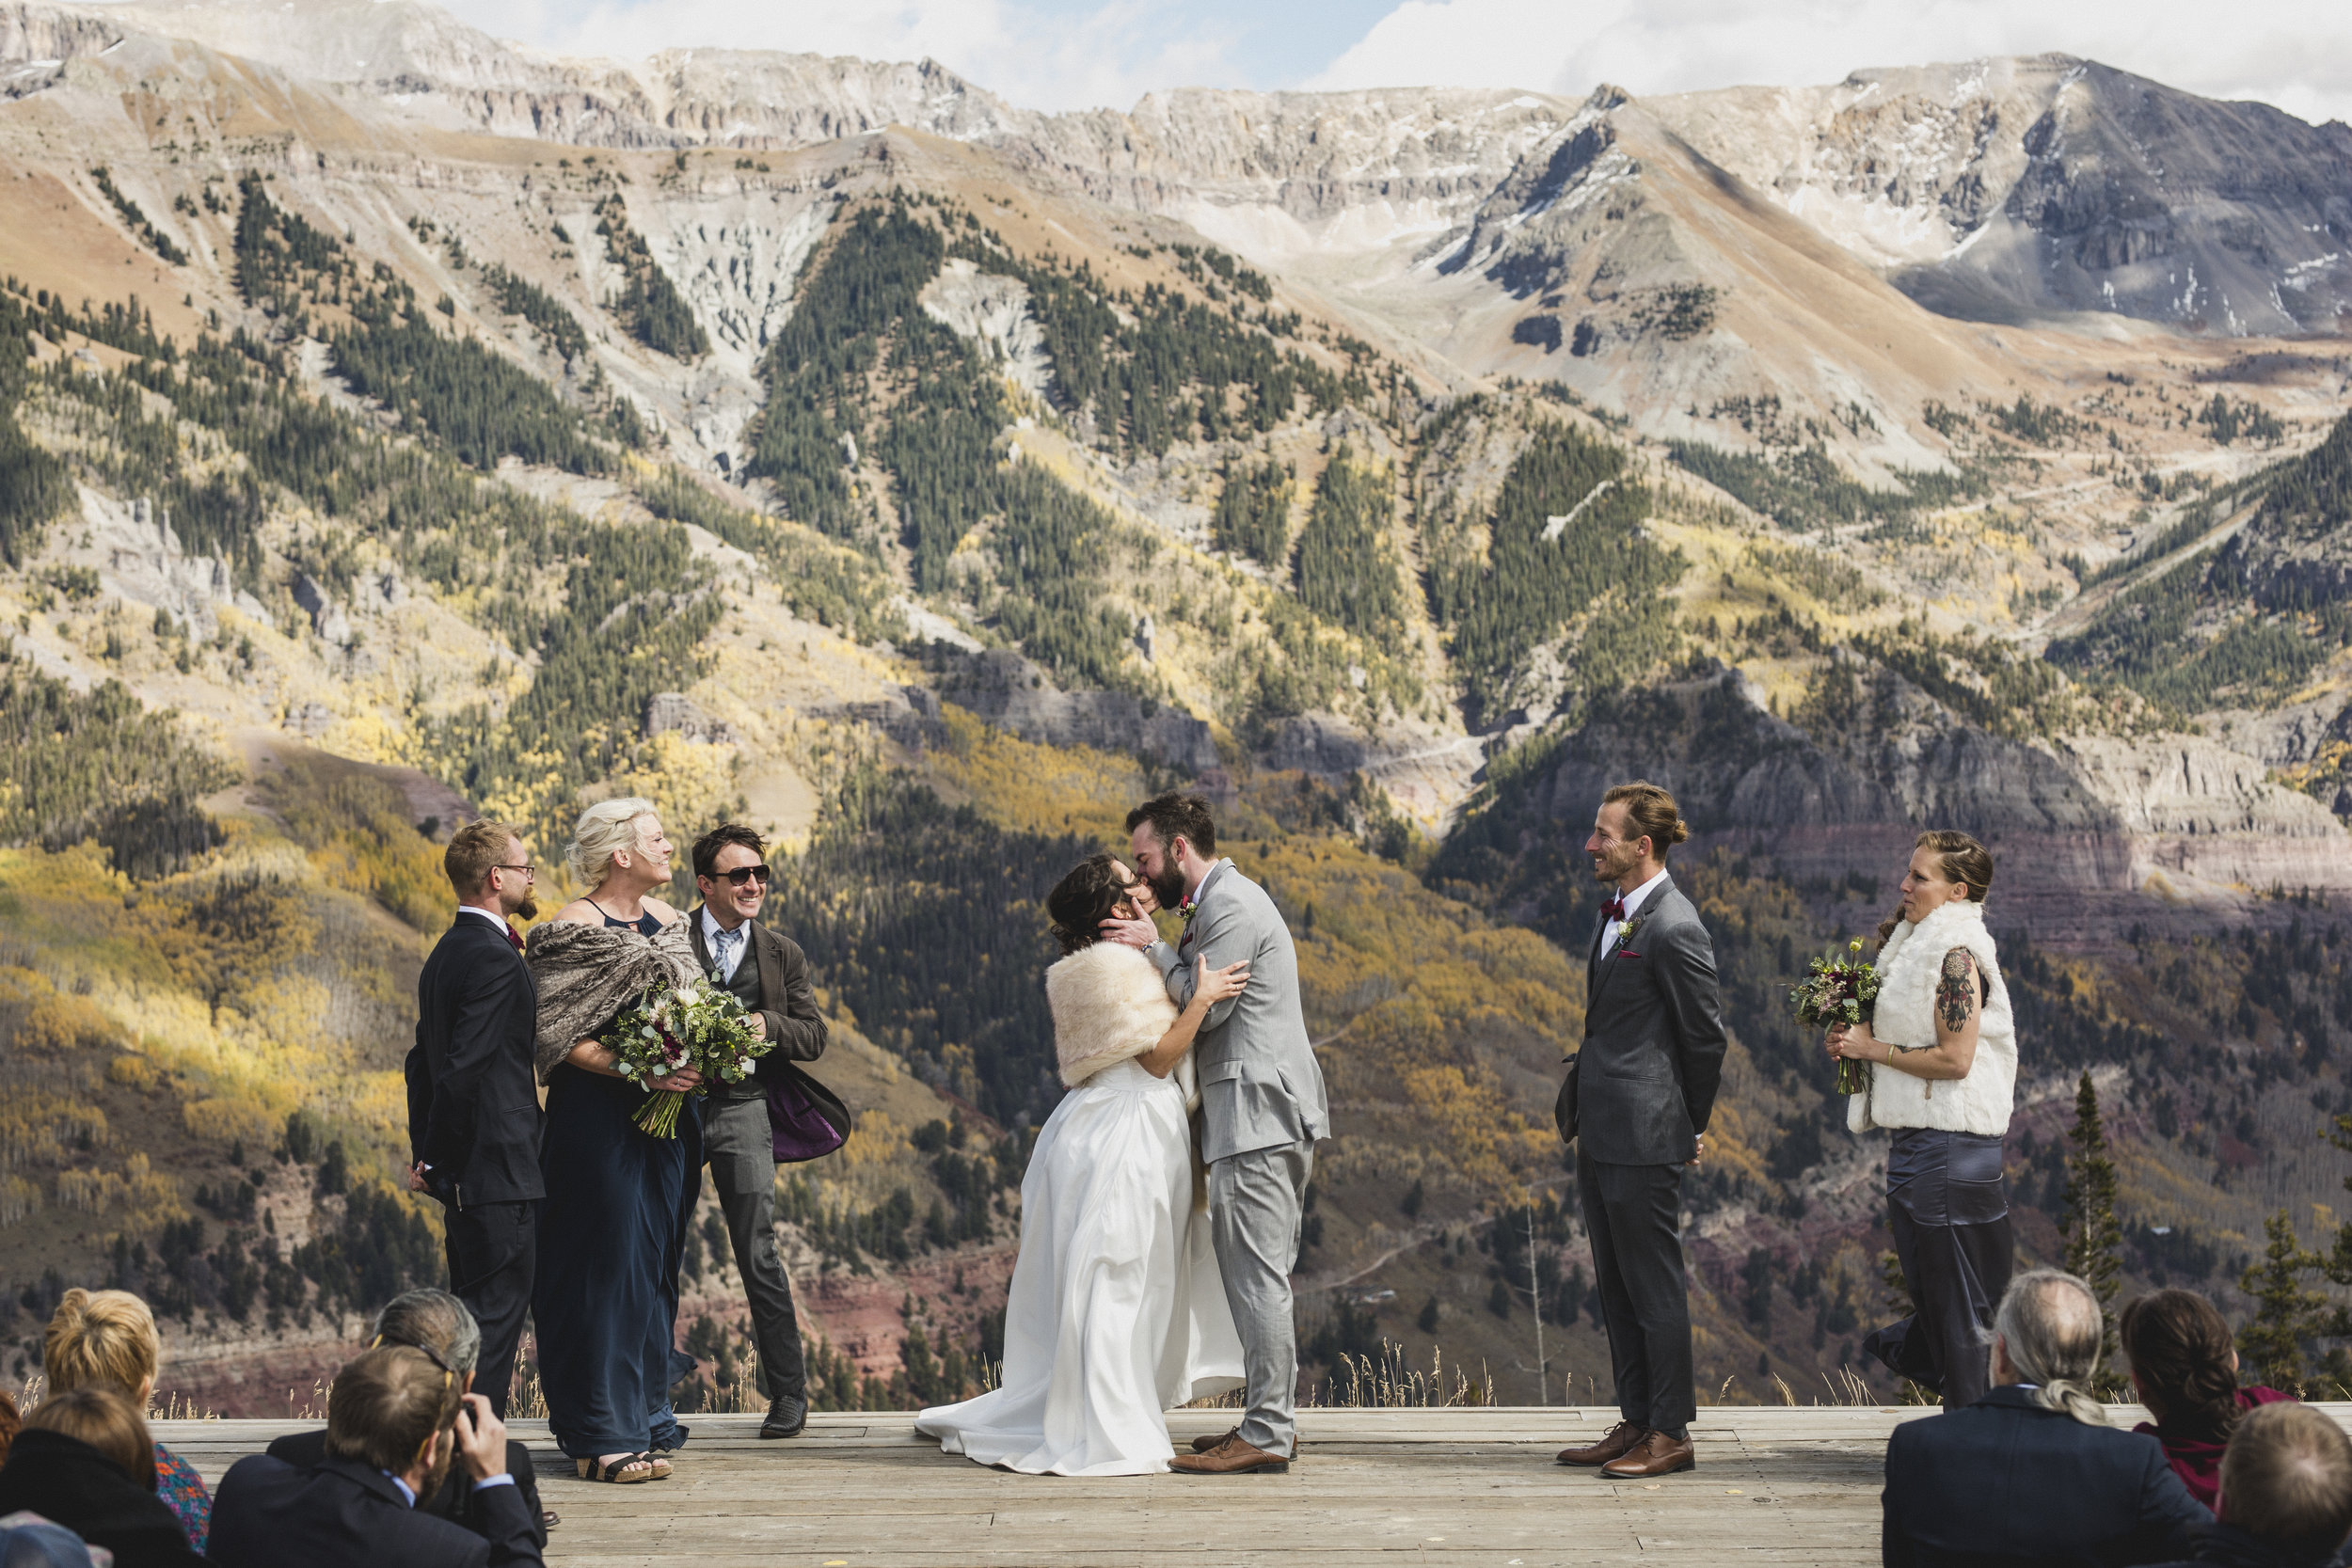 NE-LeahandAshtonphotography-Telluride-Wedding-Photography-9412.jpg